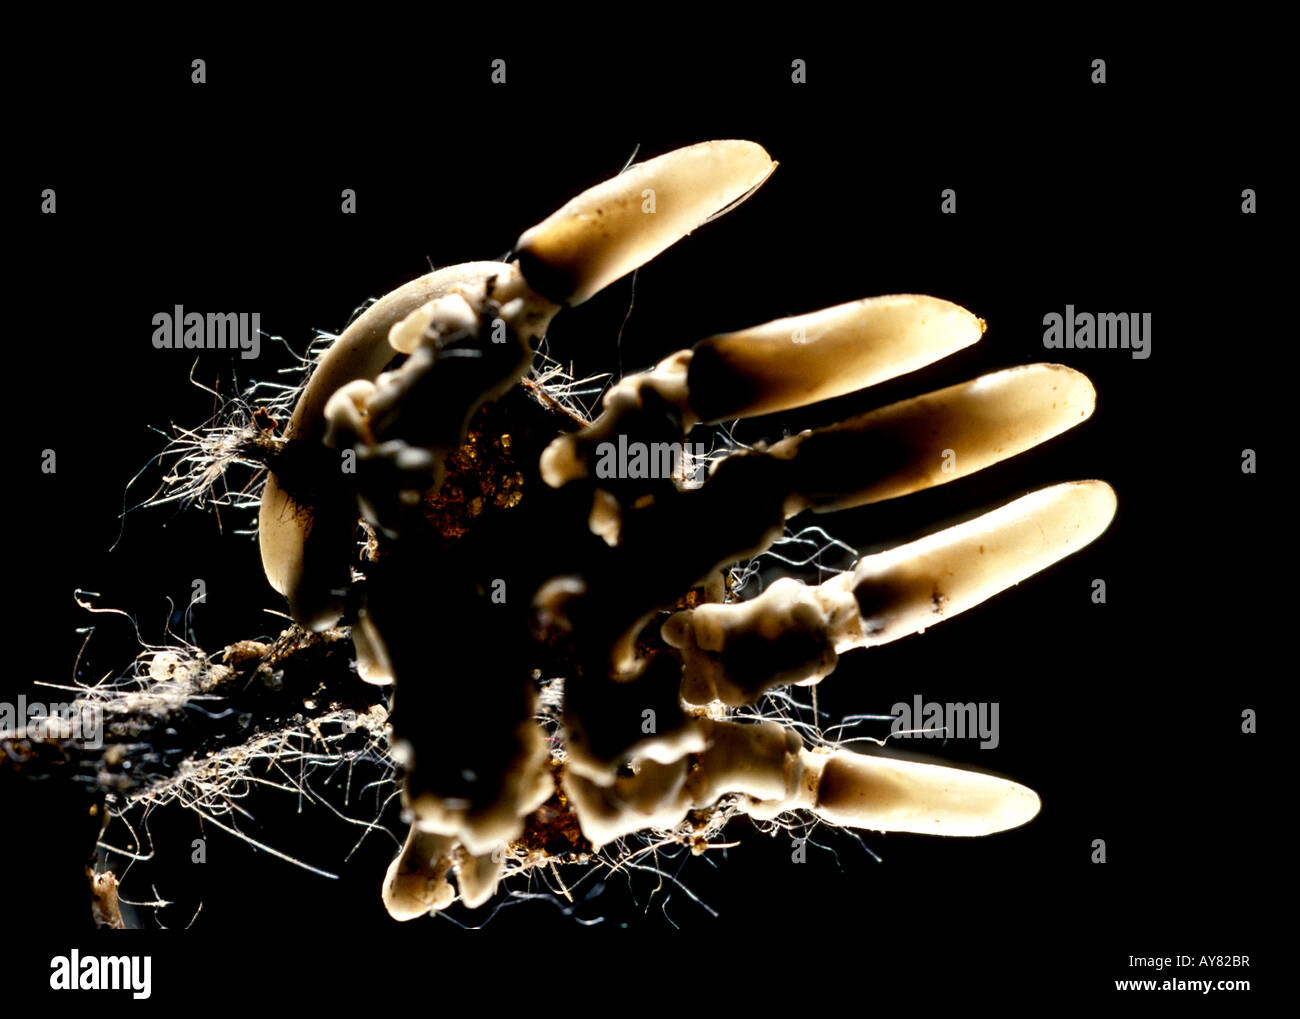 Mole foot skeleton - Stock Image